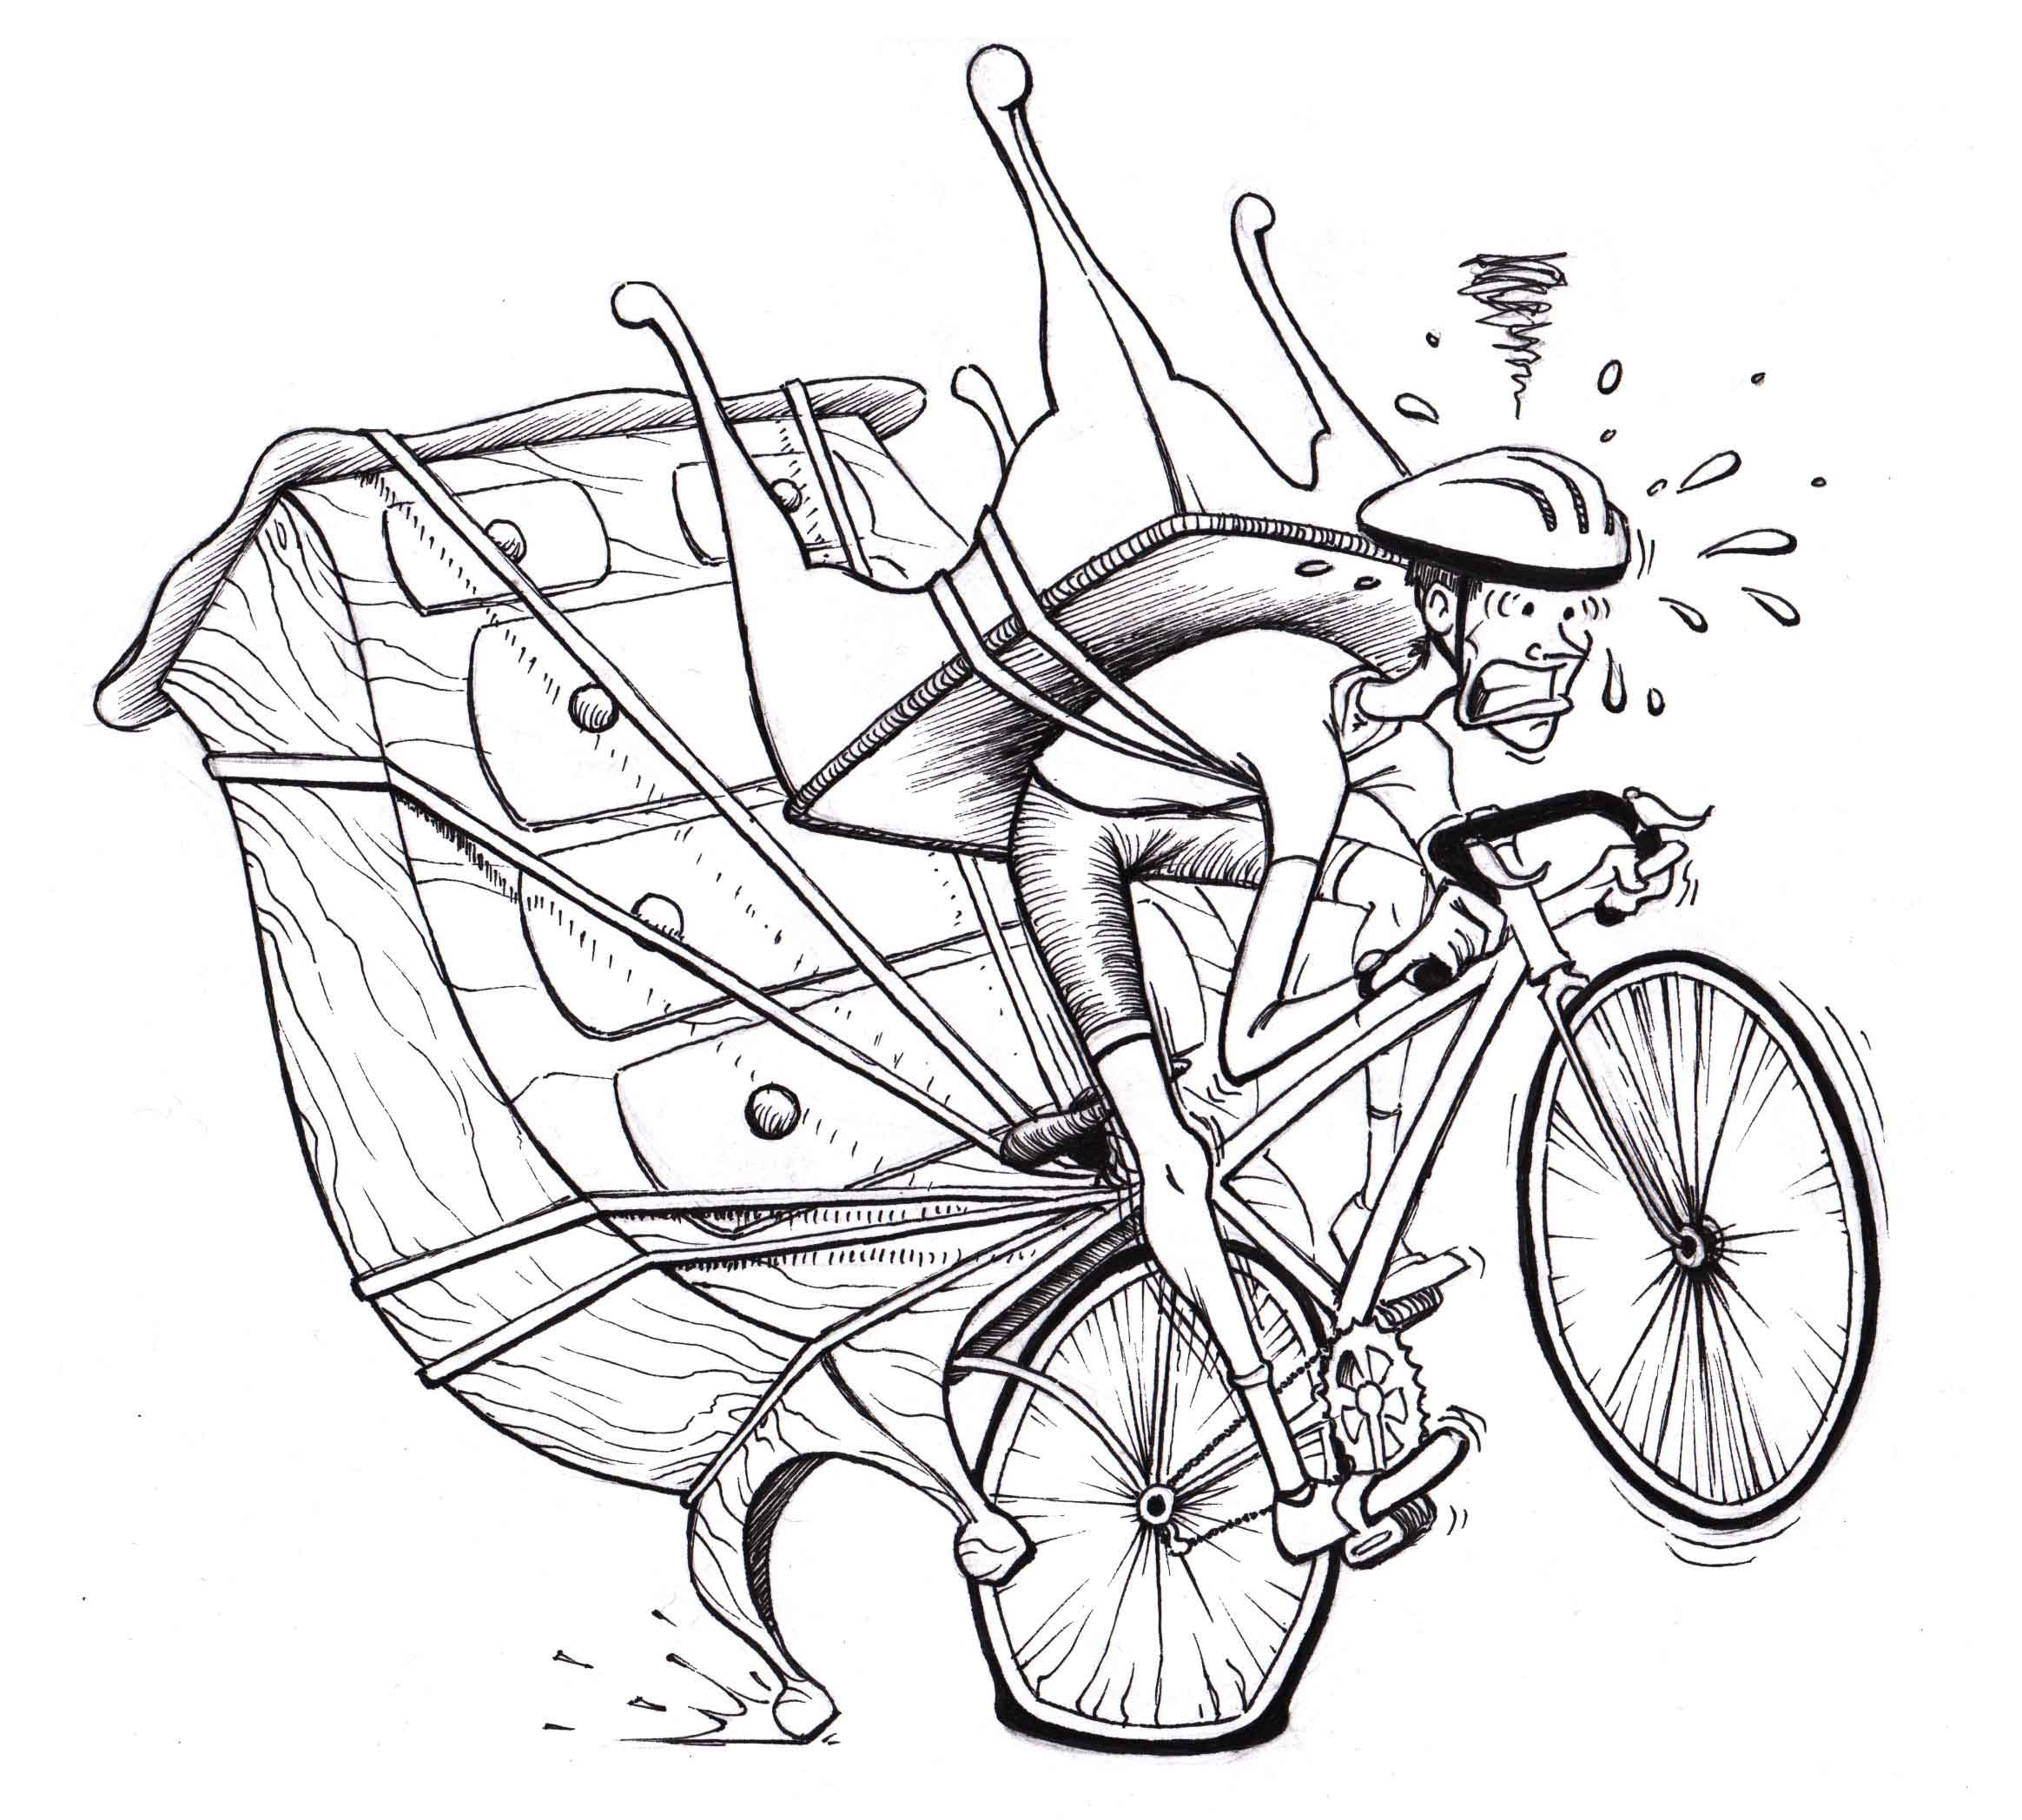 Antiquing Cyclist - Kipp T. Jarden